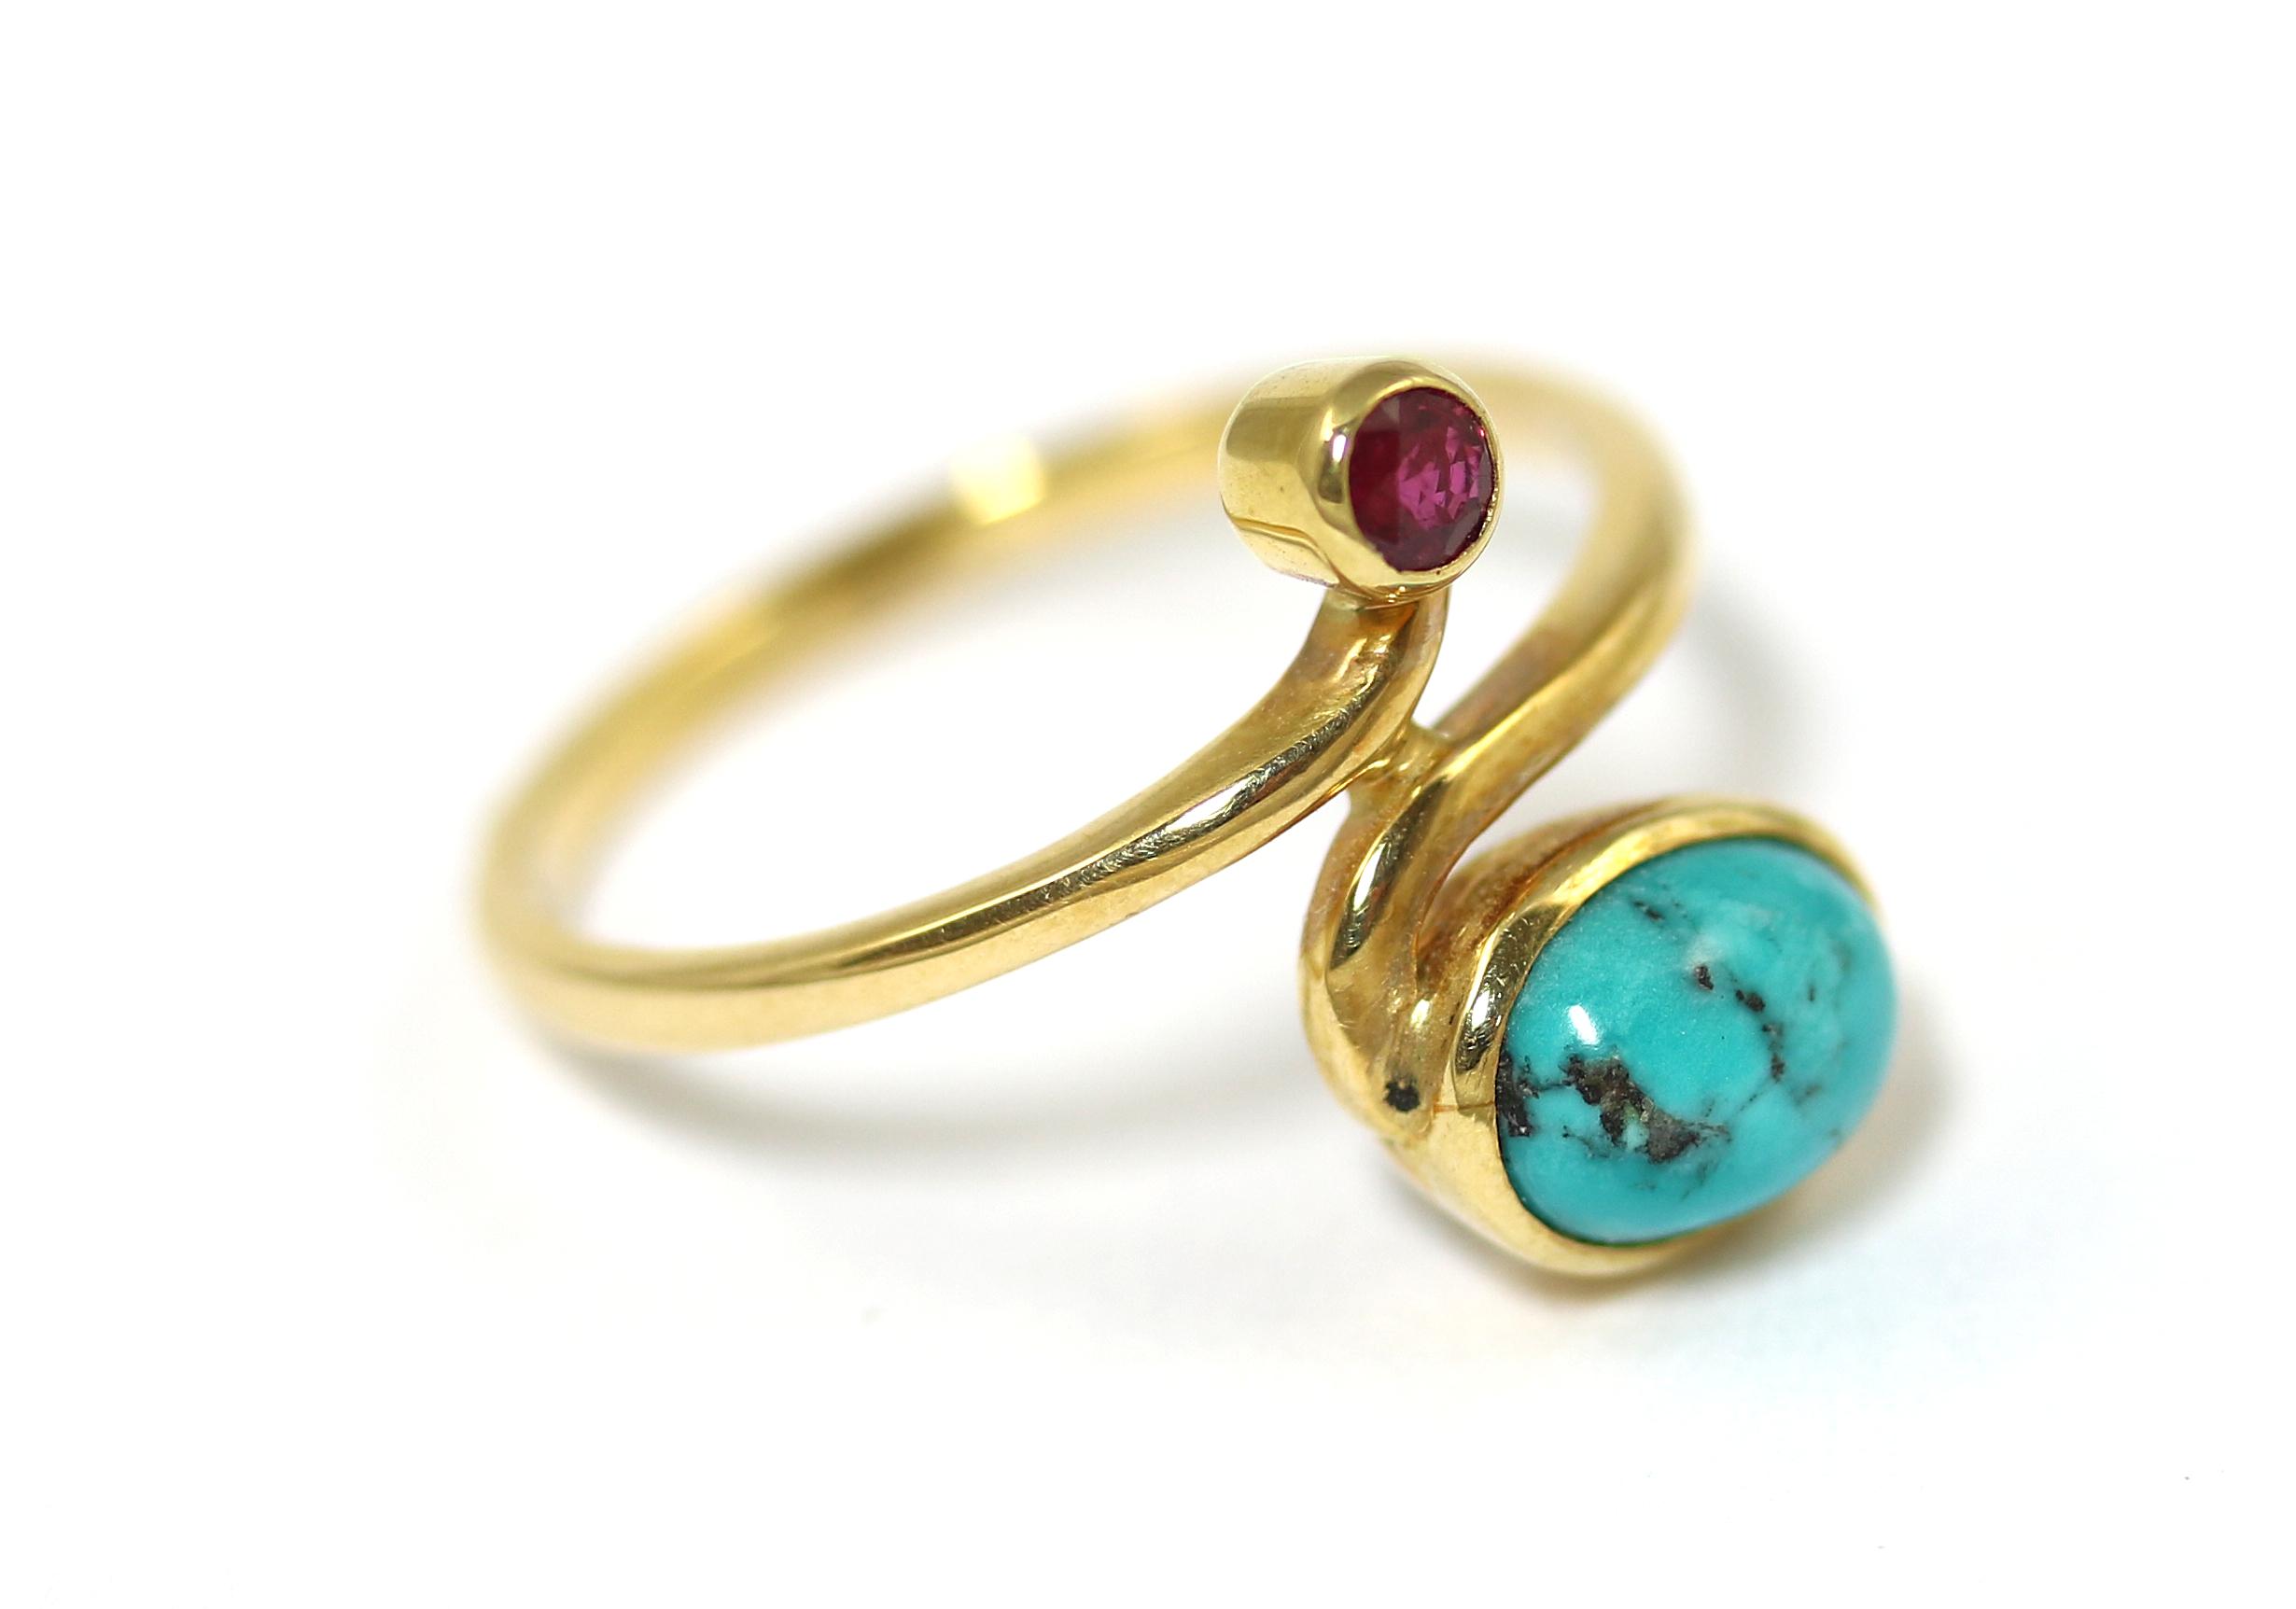 Vintage Türkis Ring